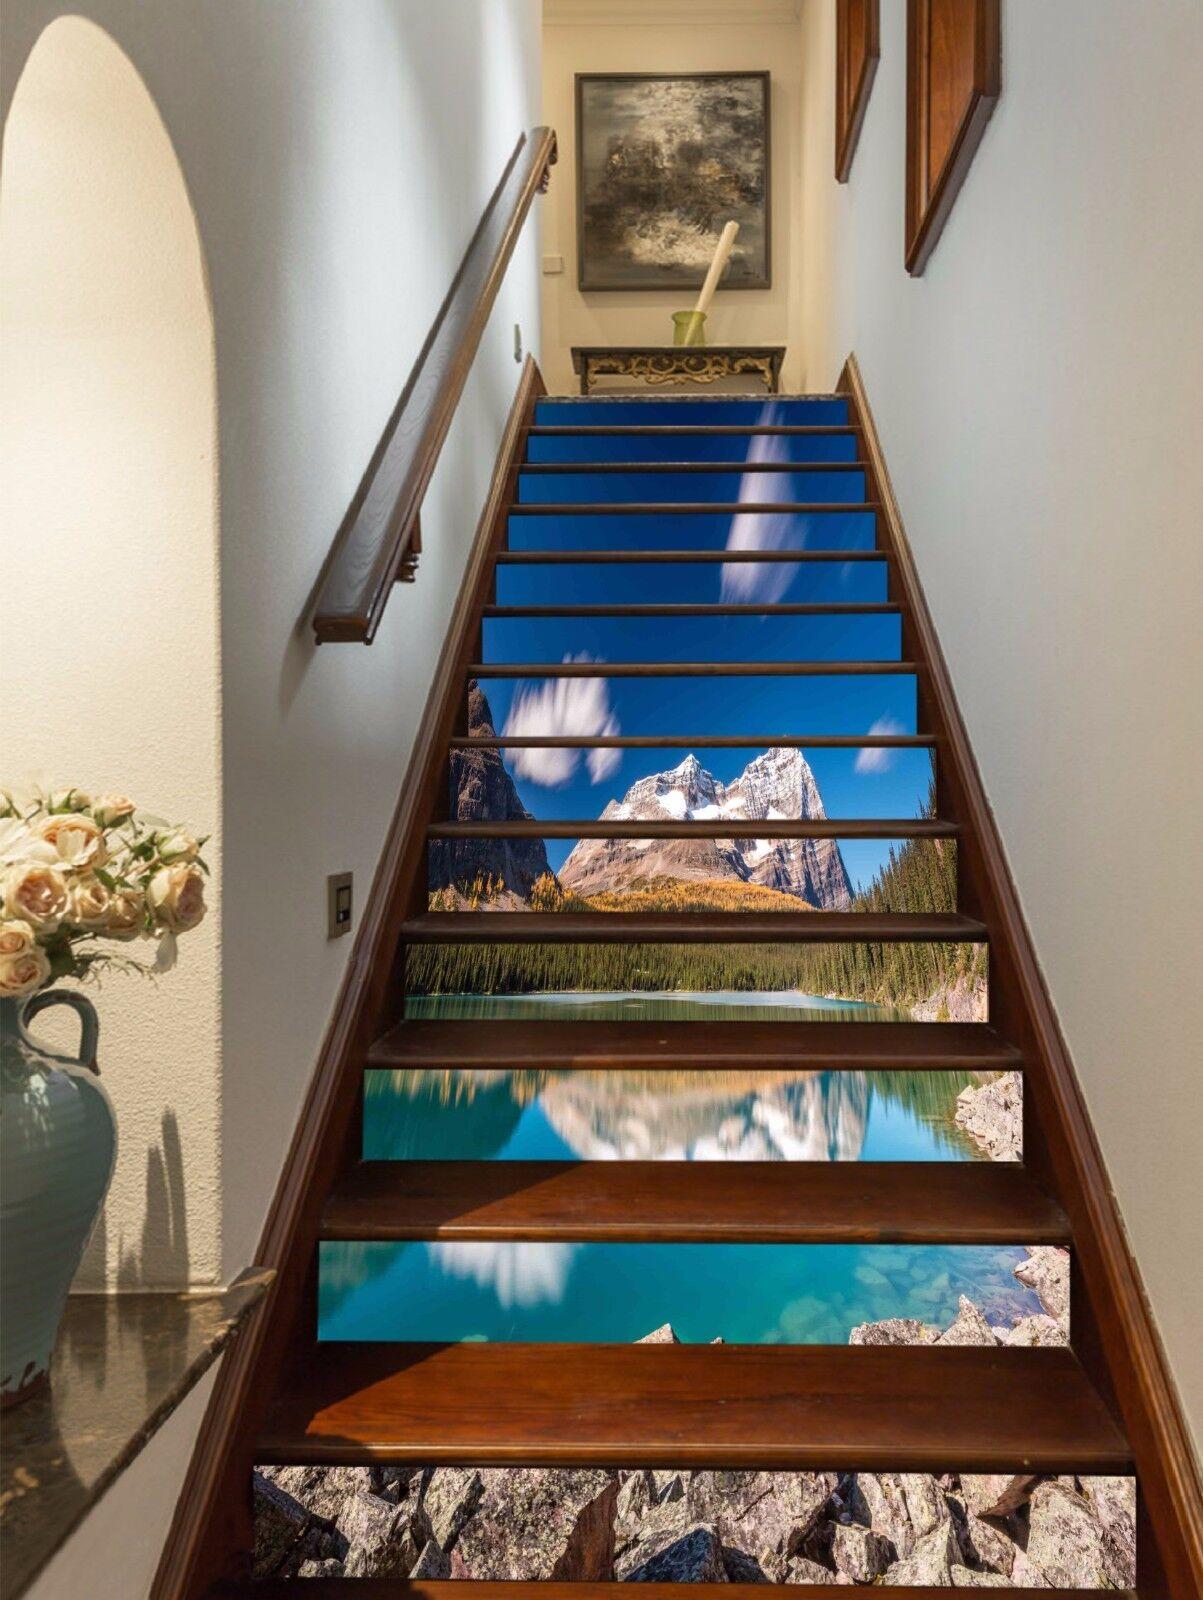 3D Pretty Lake 106 Stair Risers Decoration Photo Mural Vinyl Decal Wallpaper AU